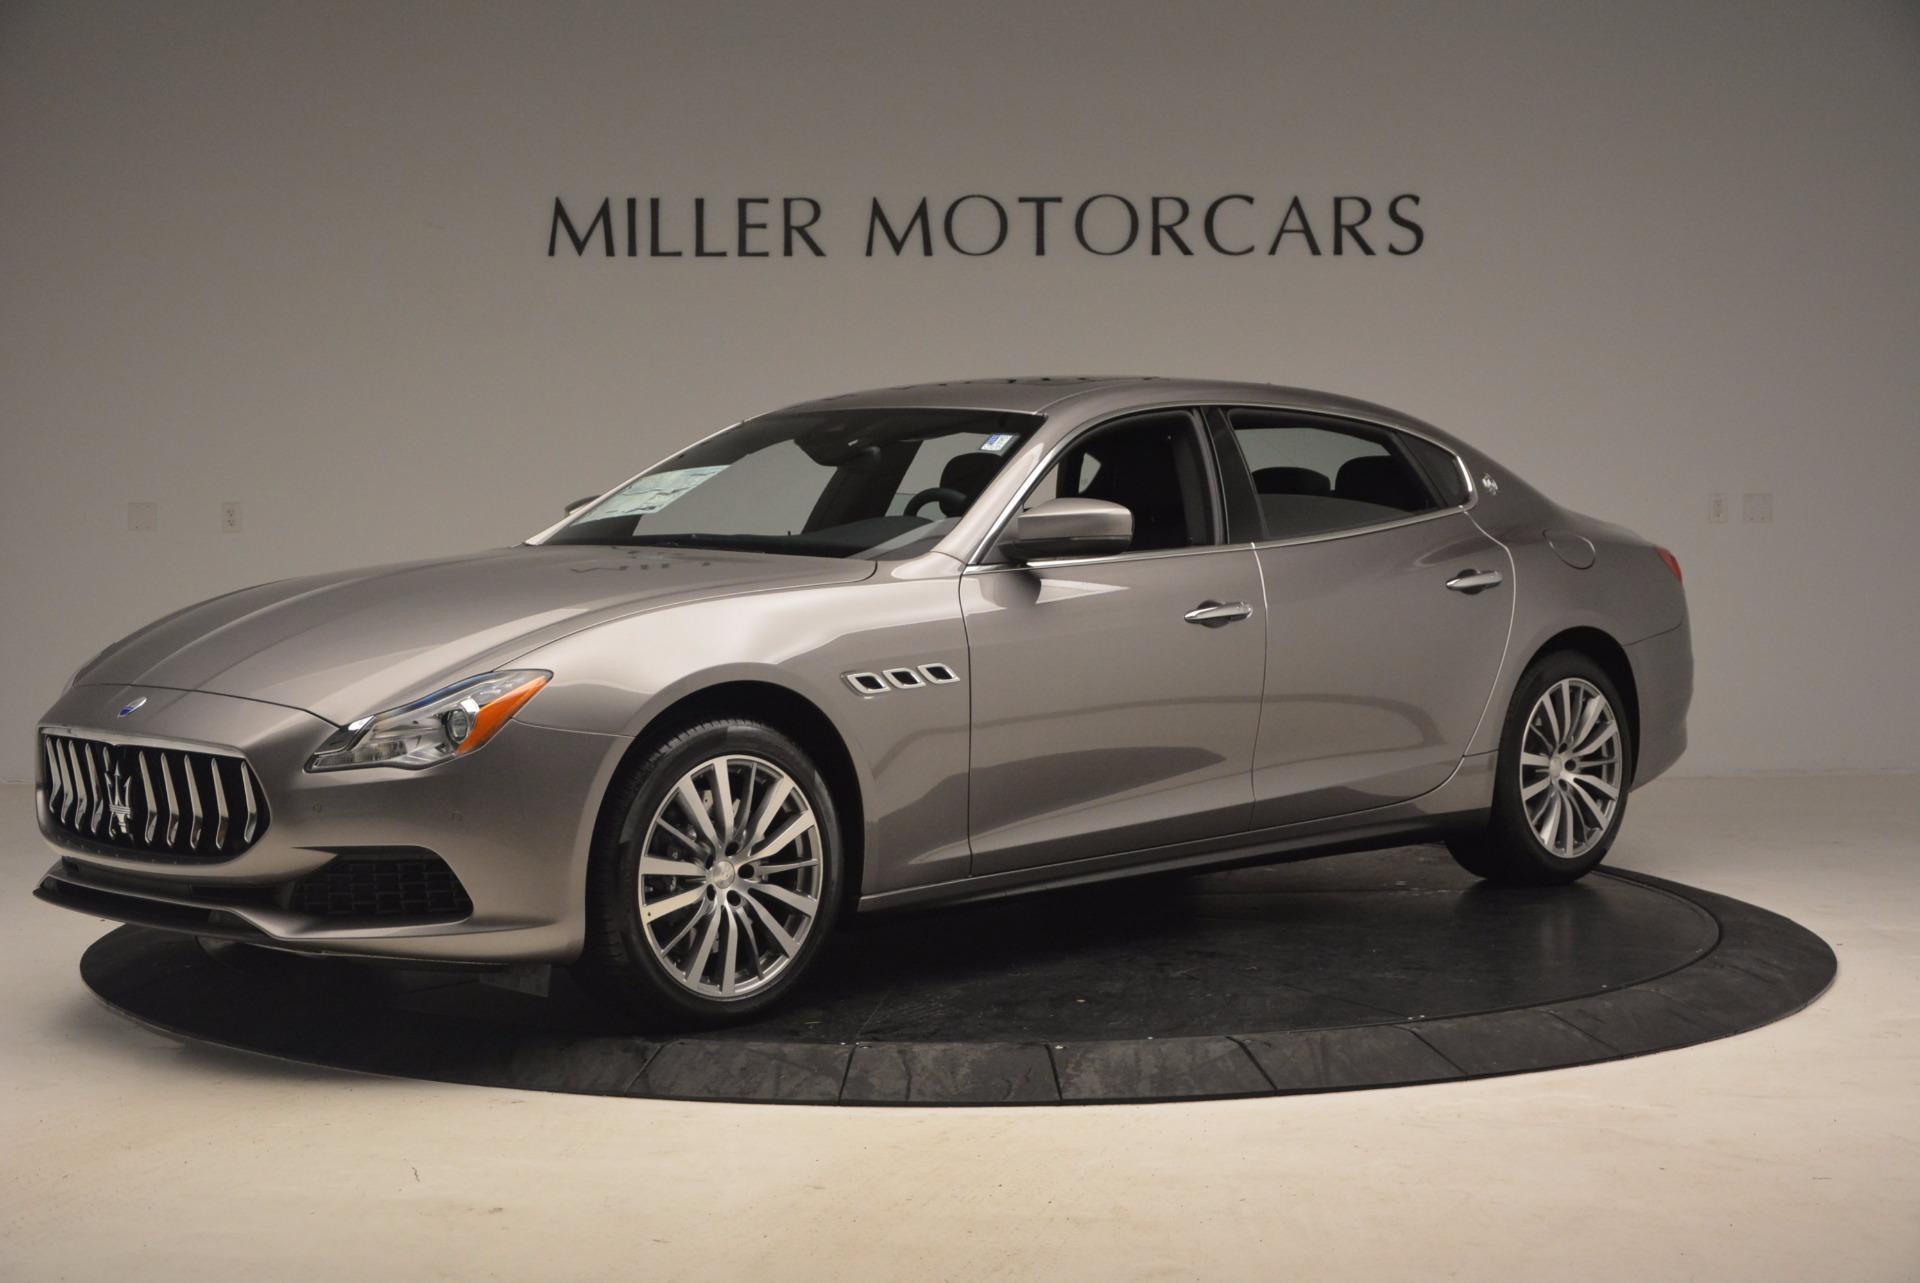 New 2017 Maserati Quattroporte SQ4 For Sale In Westport, CT 1090_p2